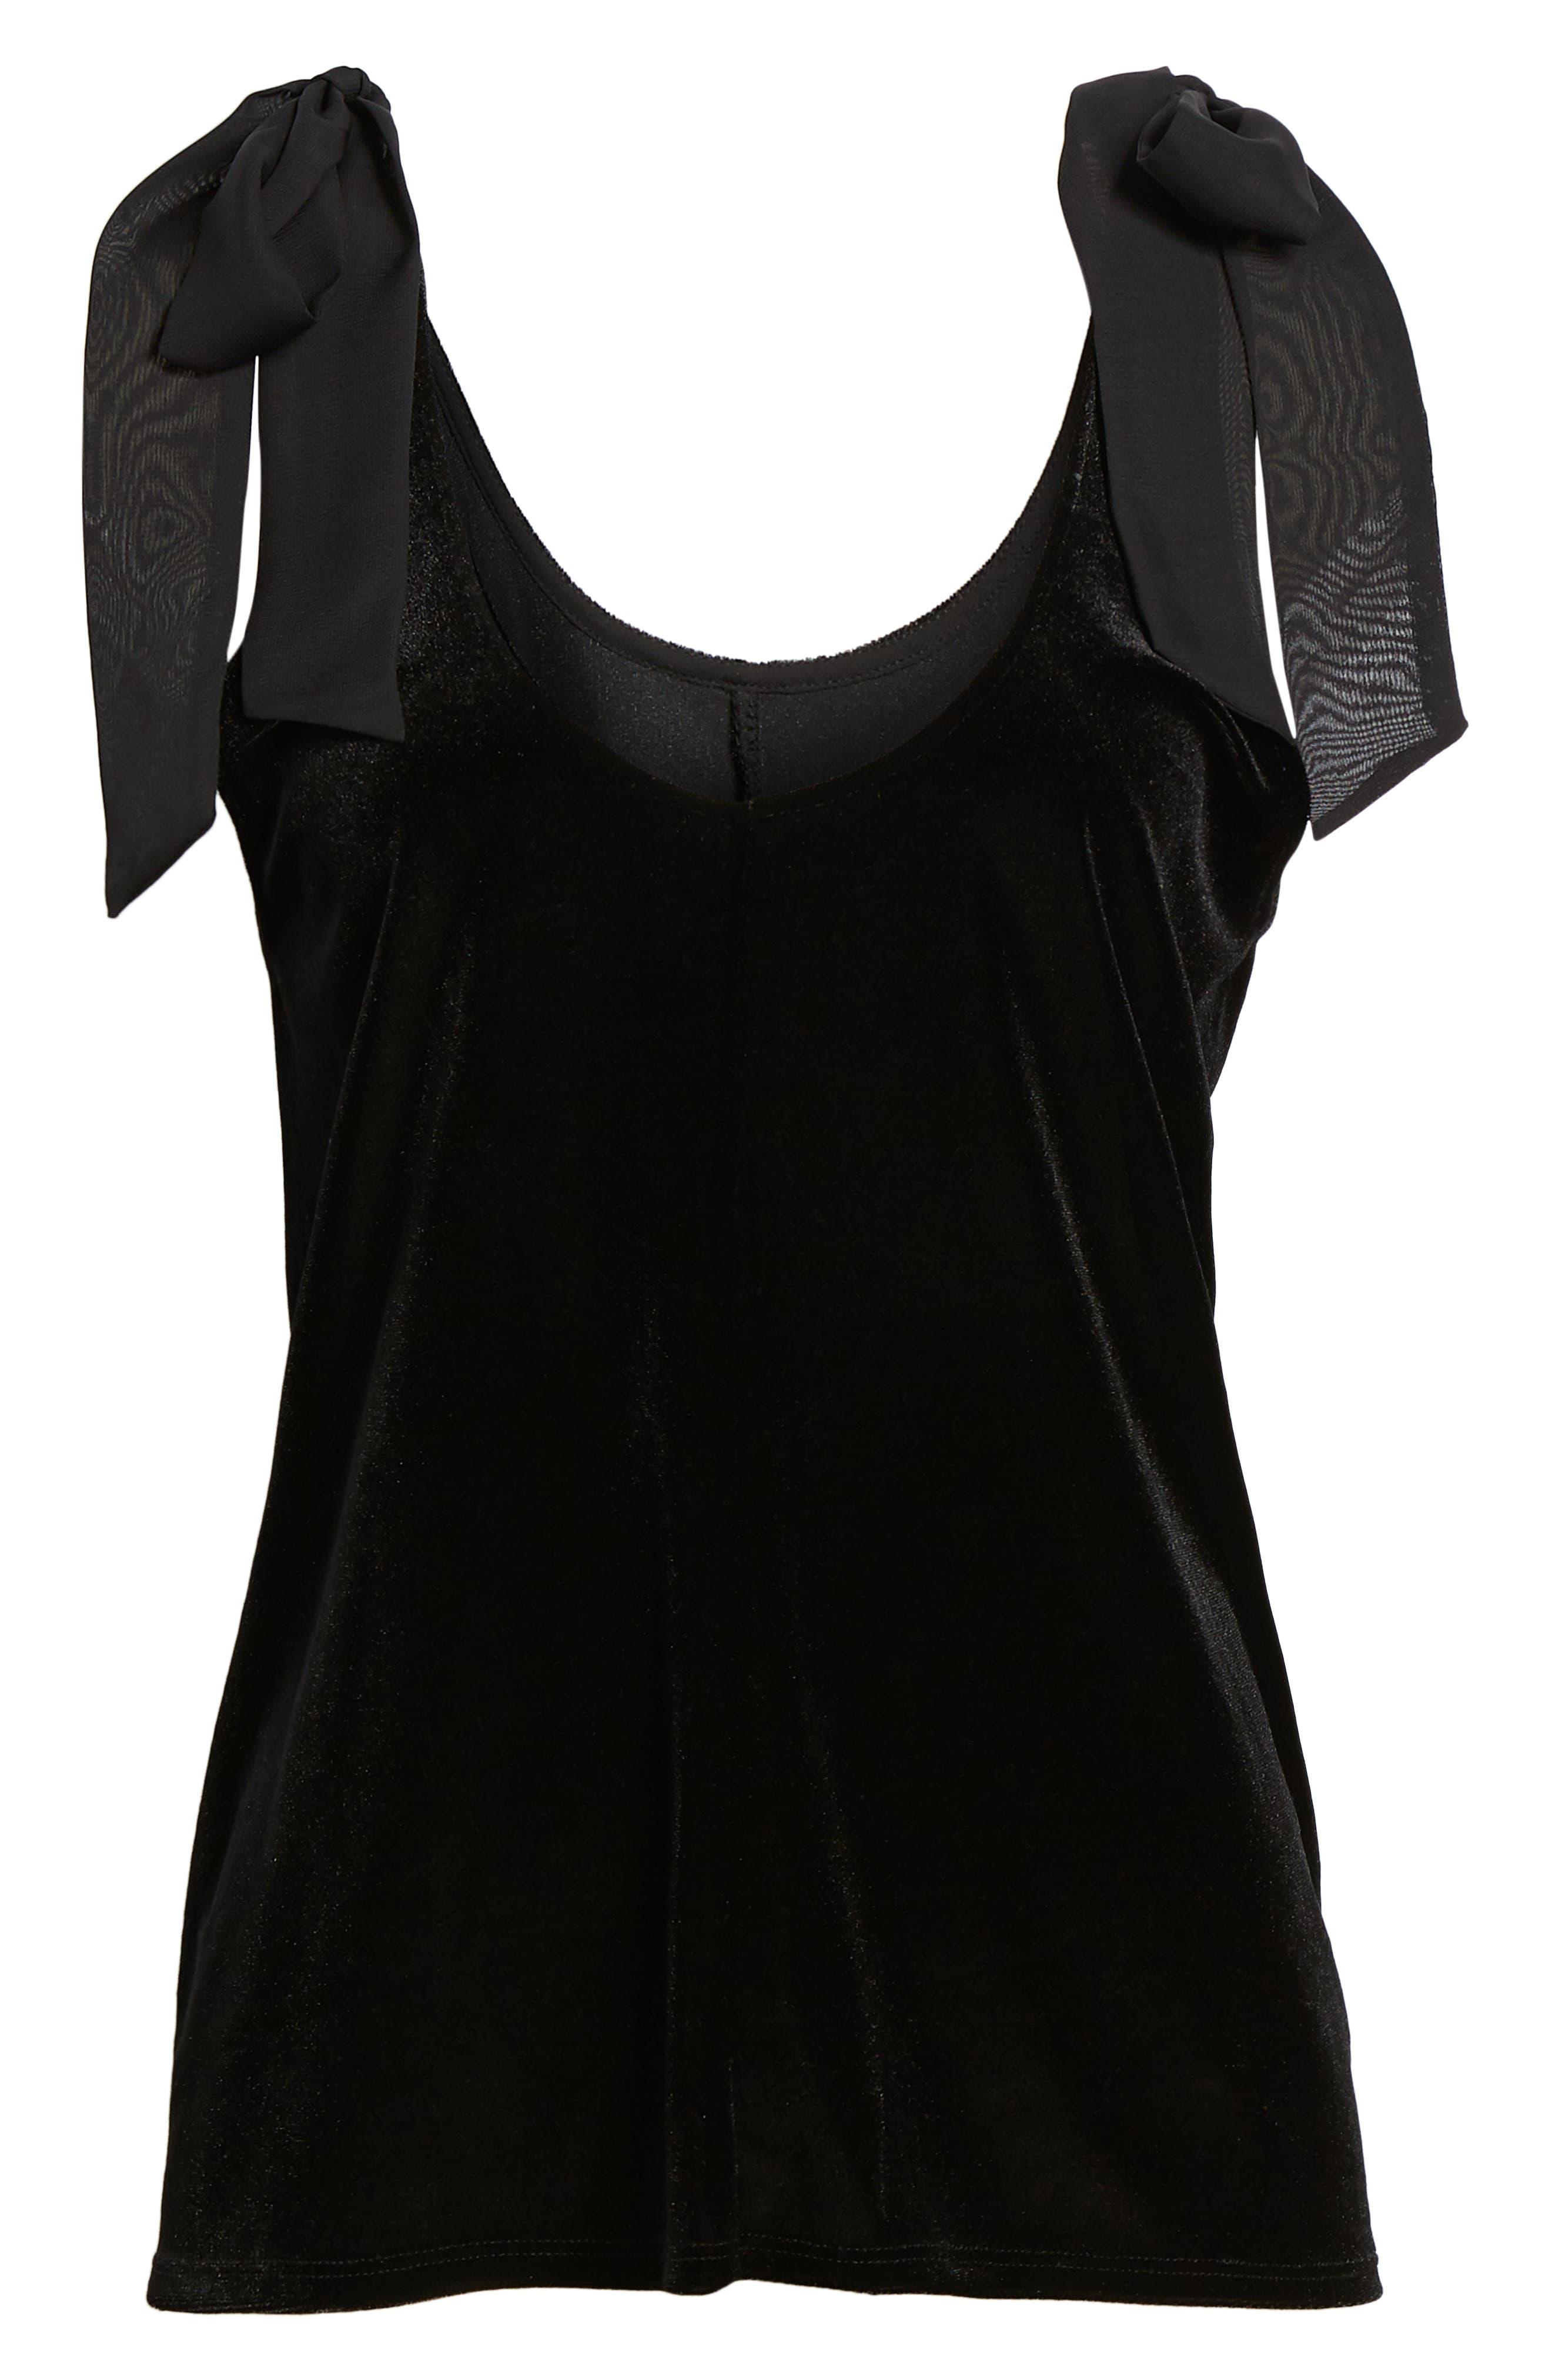 x Glam Squad Tara Bow Detail Velvet Top,                             Alternate thumbnail 7, color,                             BLACK